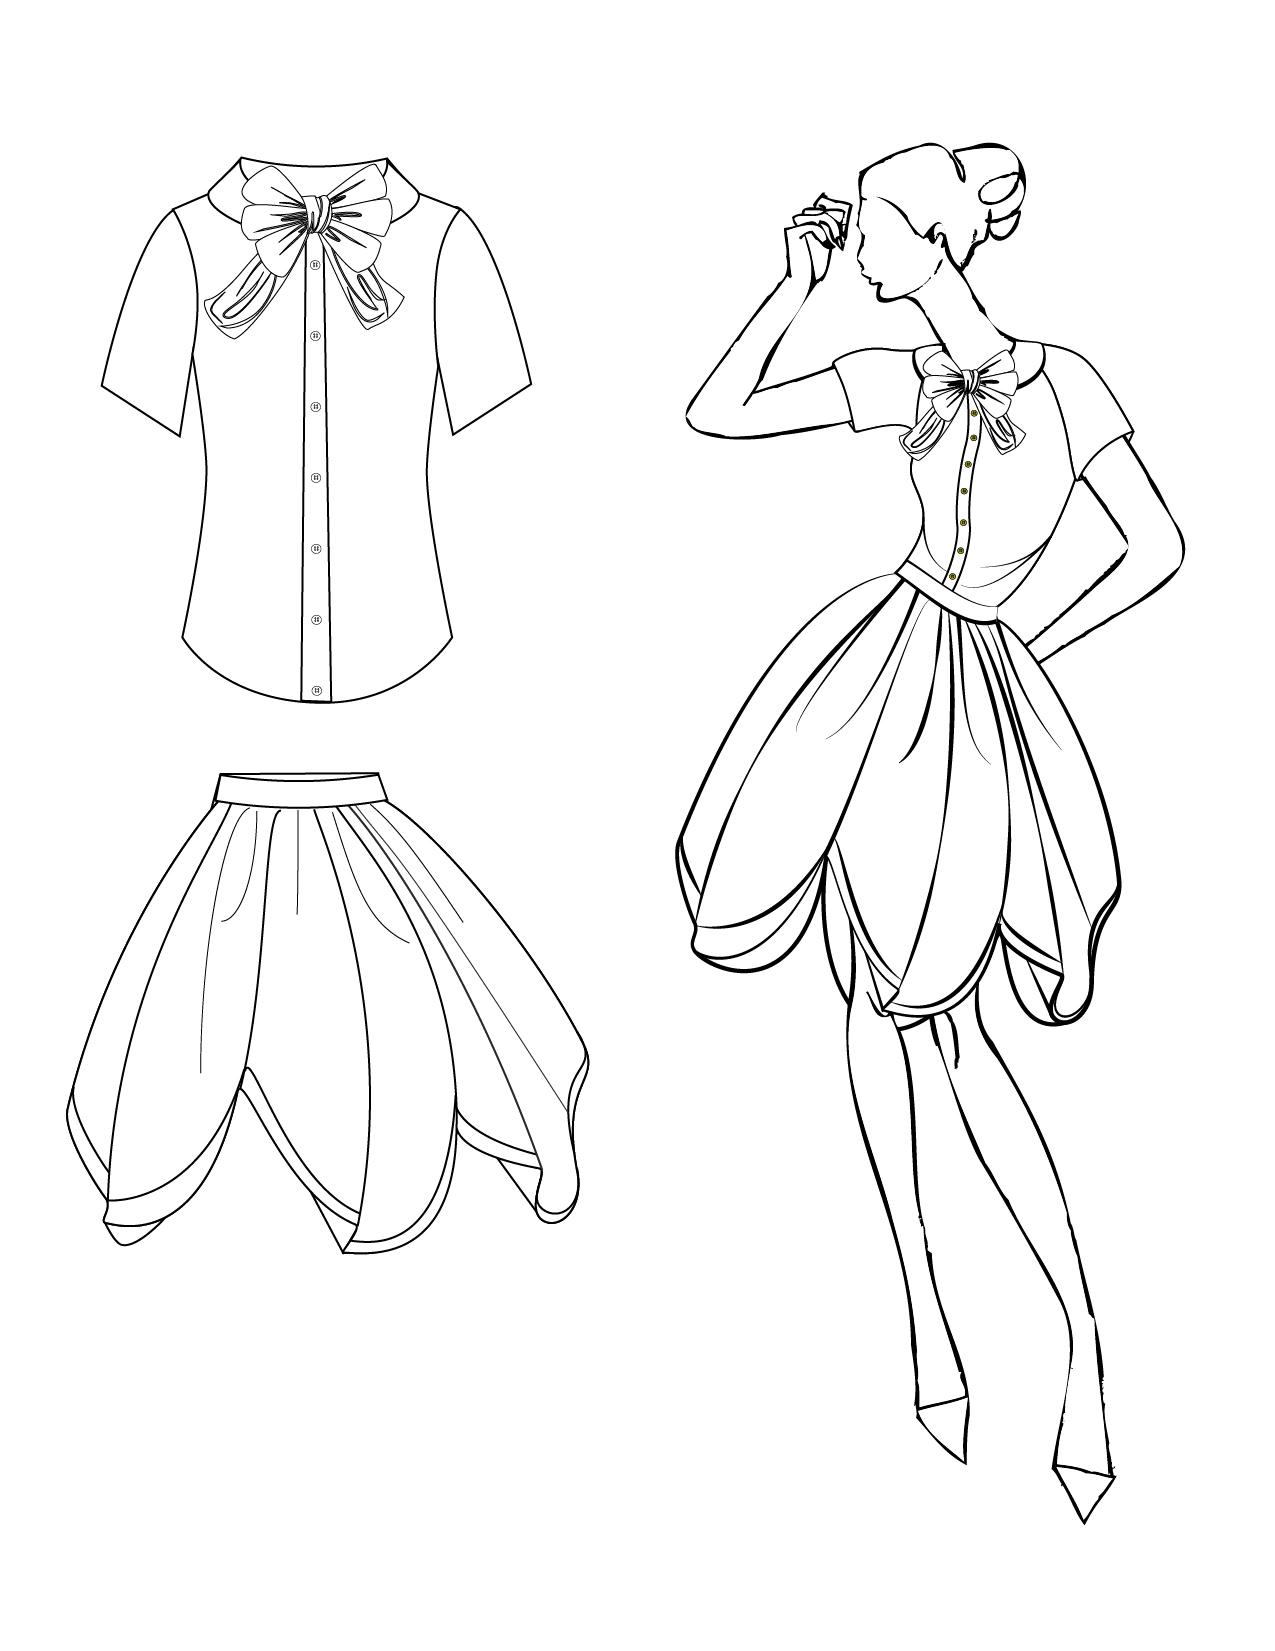 fashion-illustrations-25.jpg